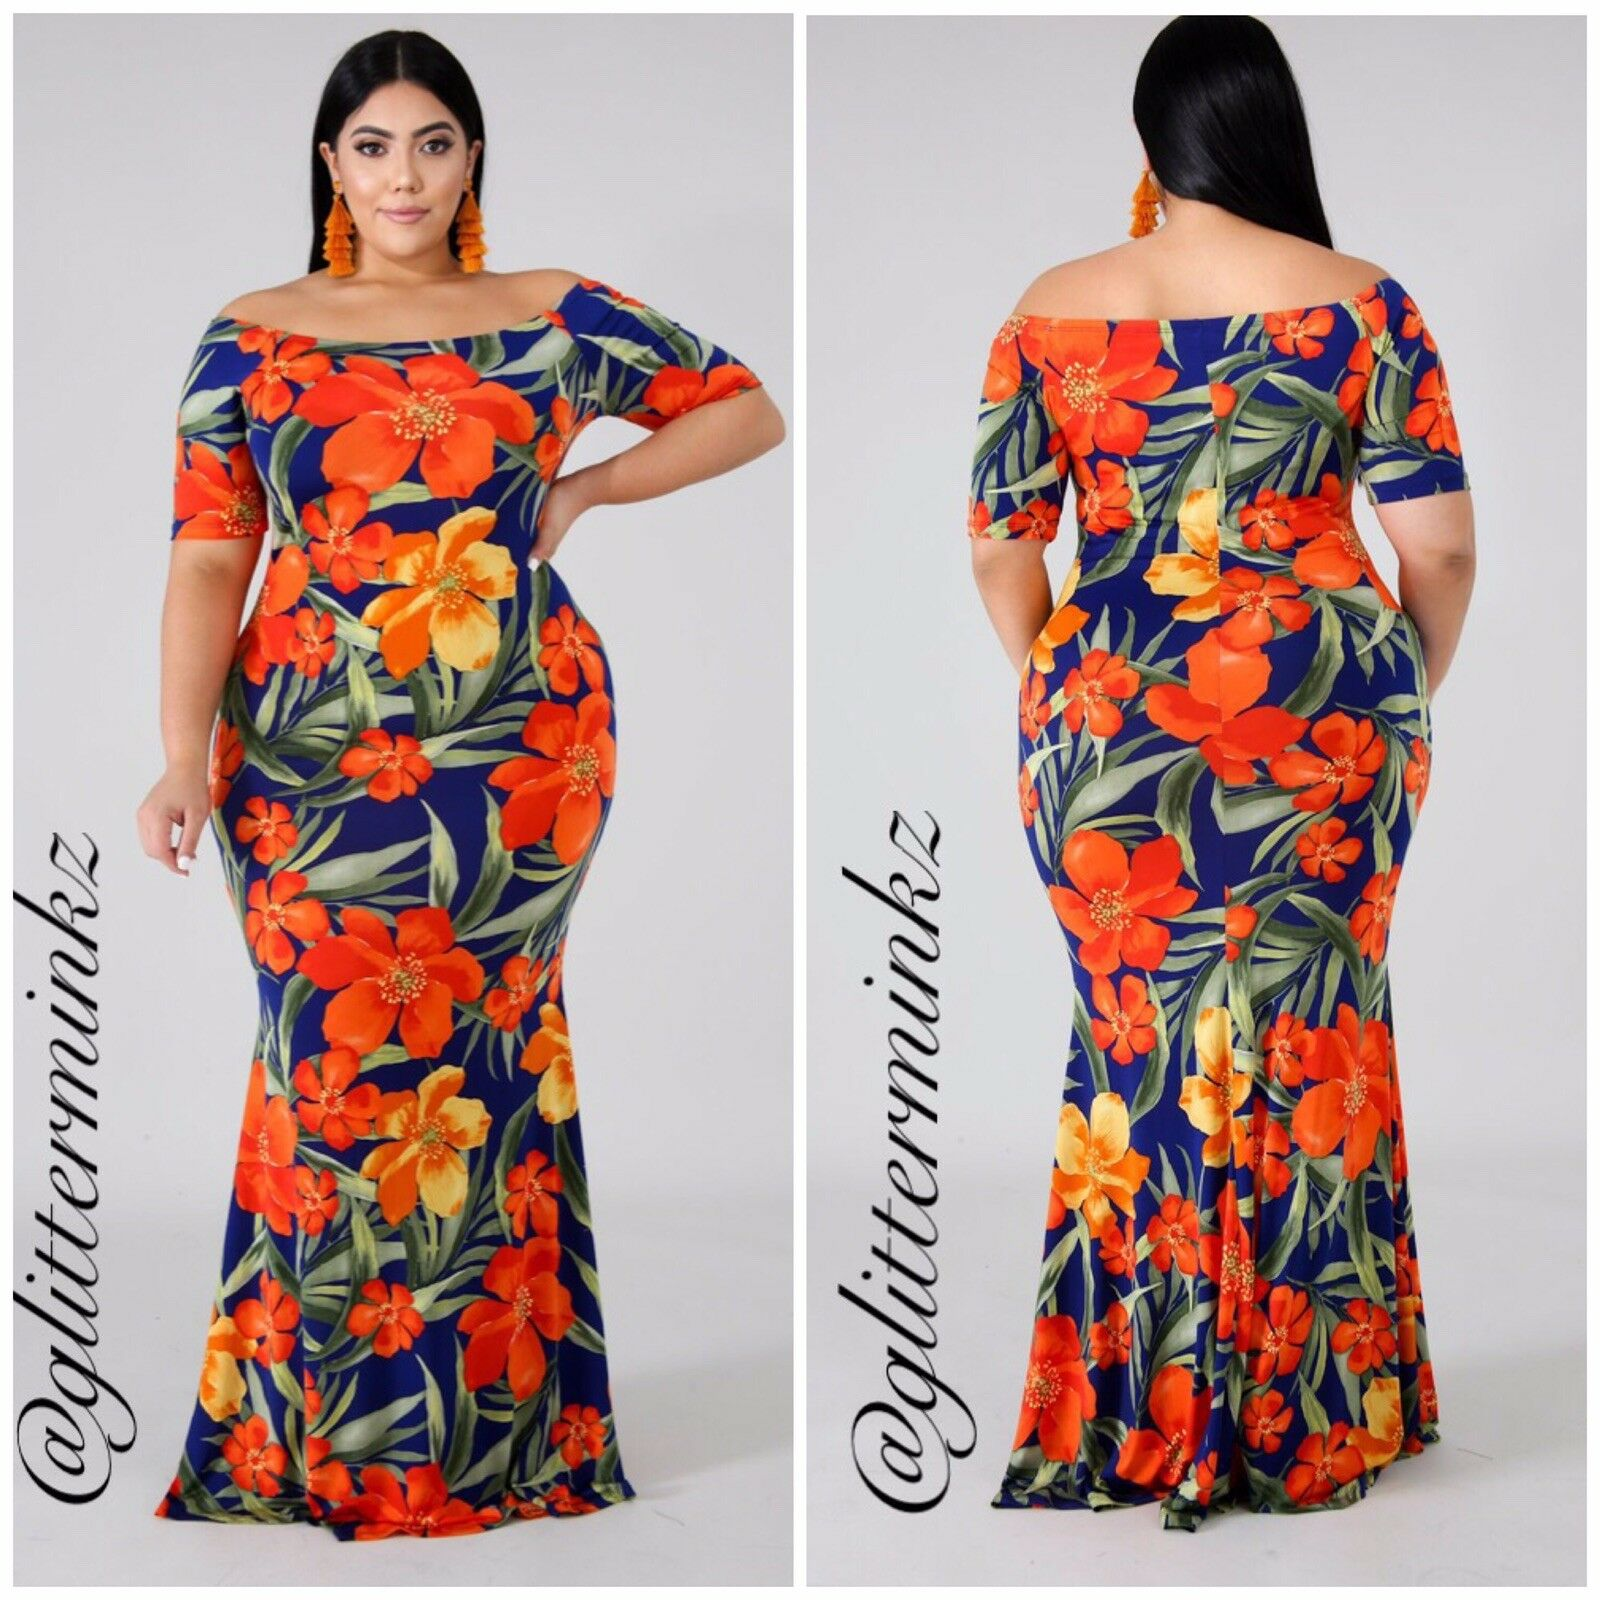 LaDieS Plus Size Off Shoulder Poppy Floral Formal  Evening Dress Size 1XL 14-16